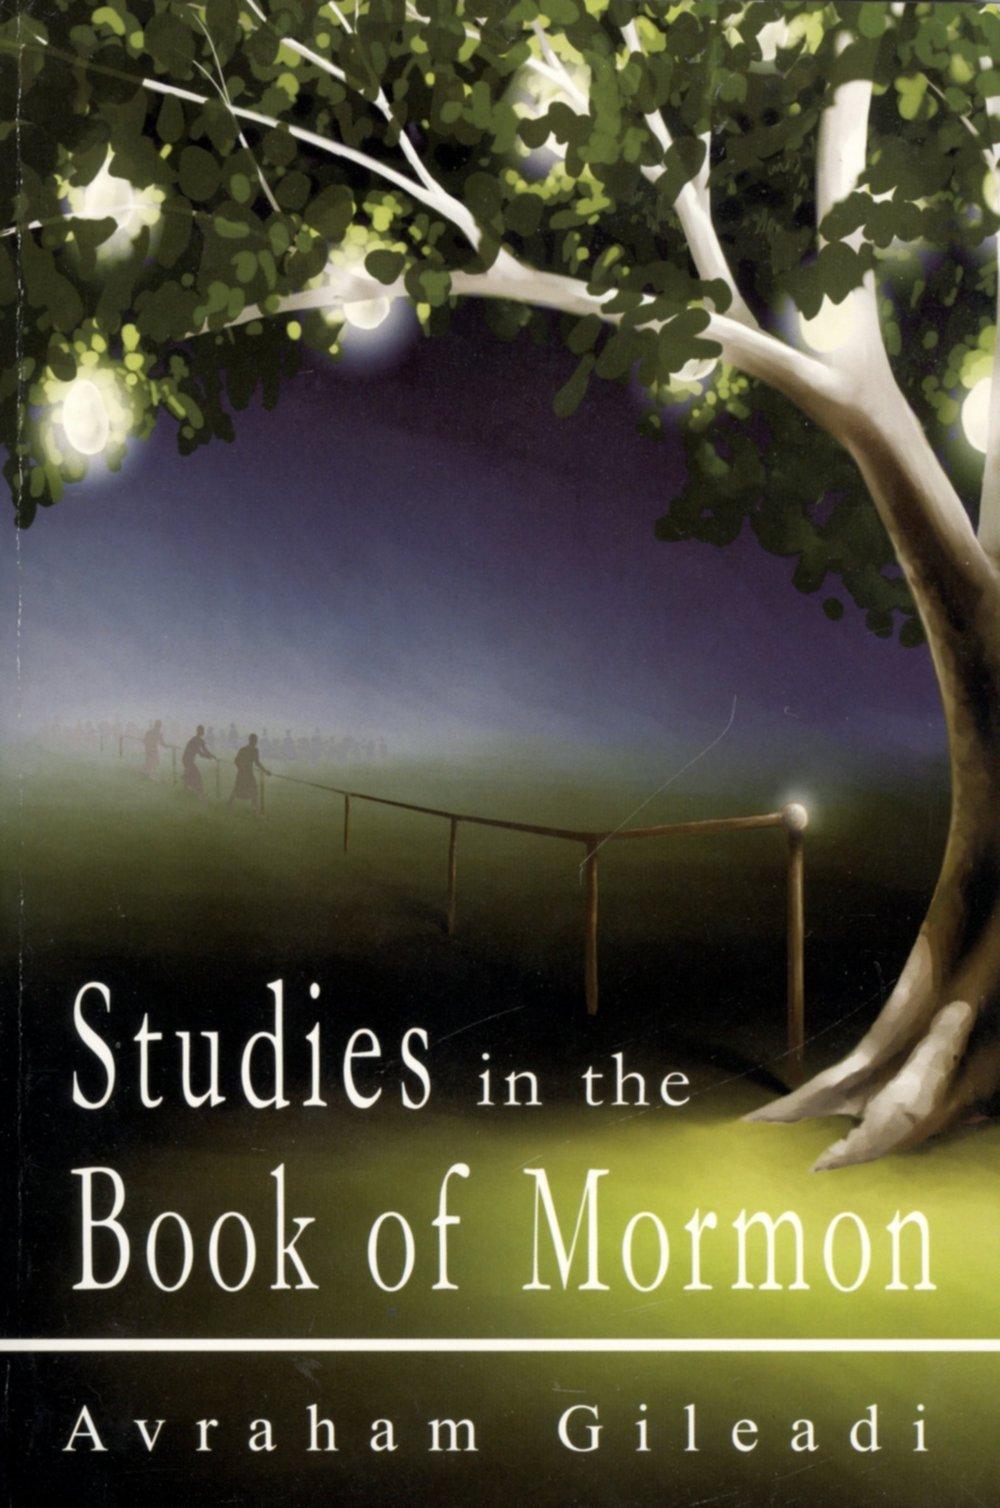 Studies in the Book of Mormon